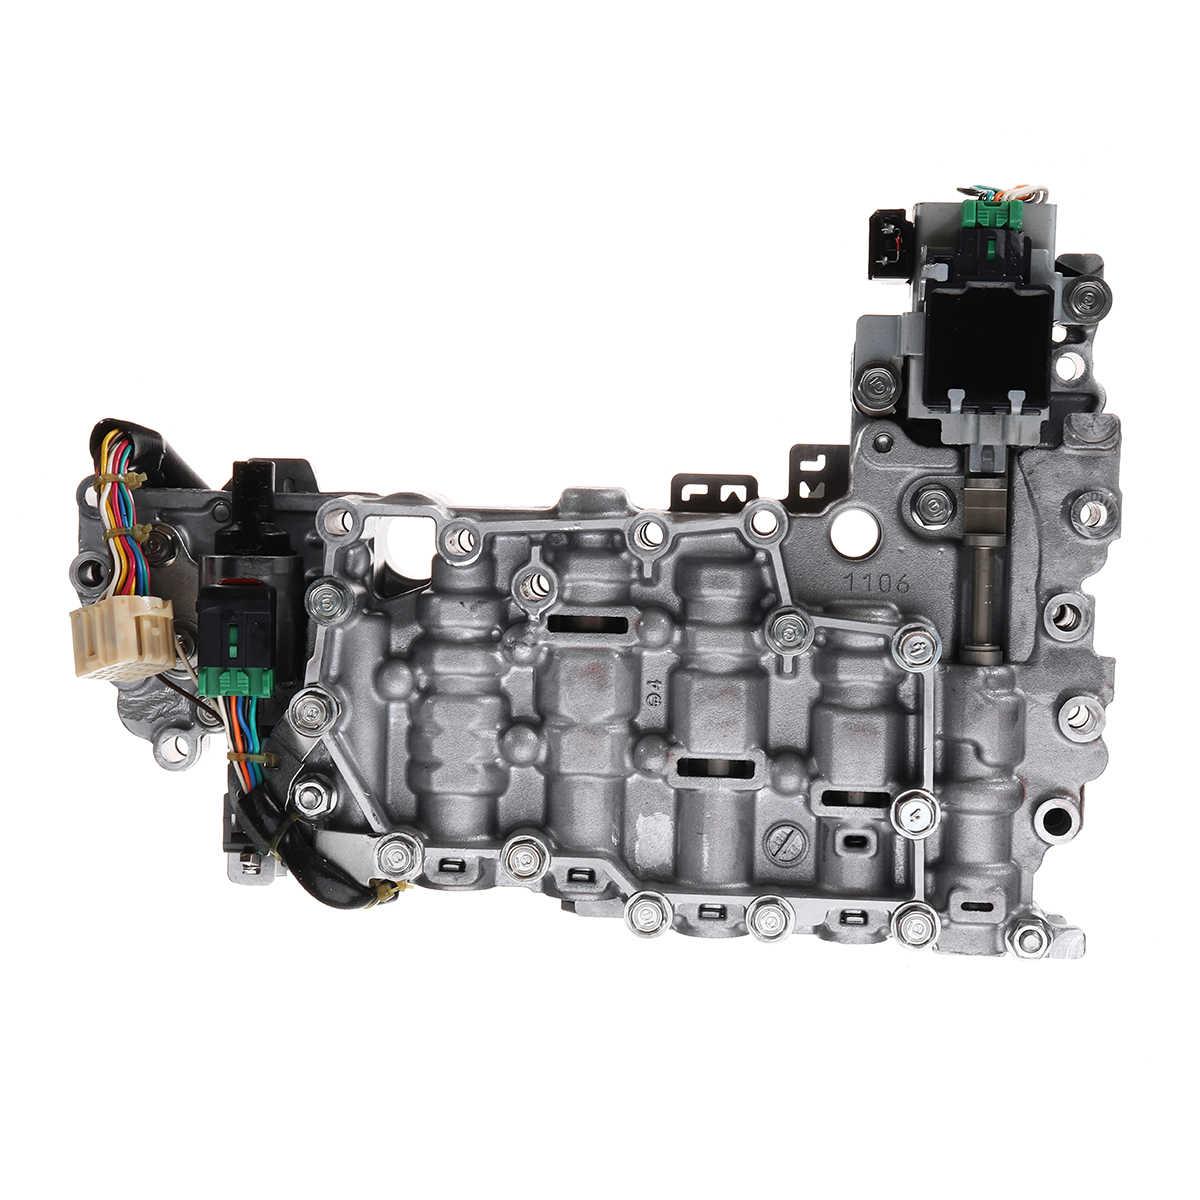 CVT JF010E RE0F09A / B Transmission Valve Body for Nissan Murano Maxima  Altima with Solenoids 31x21x11cm Iron + Aluminum